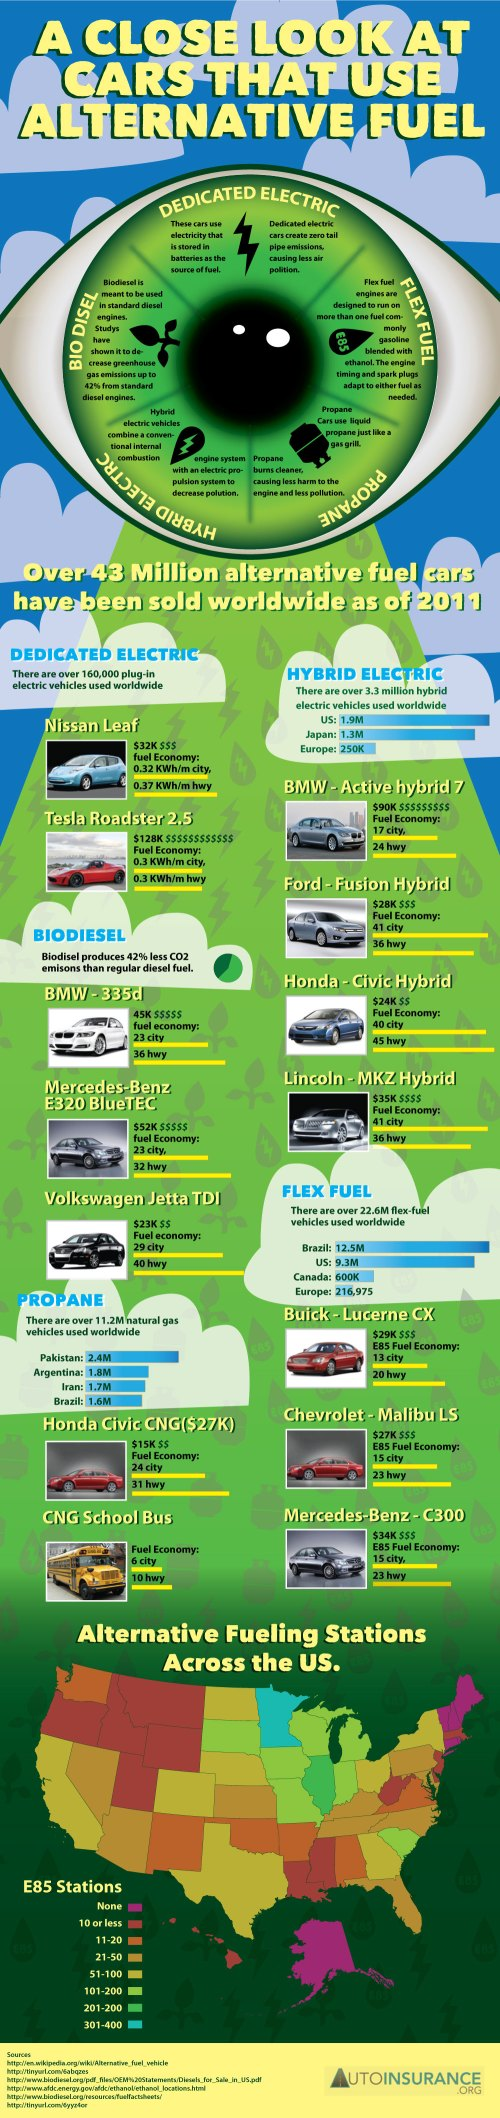 Alternative Fuel Automobiles